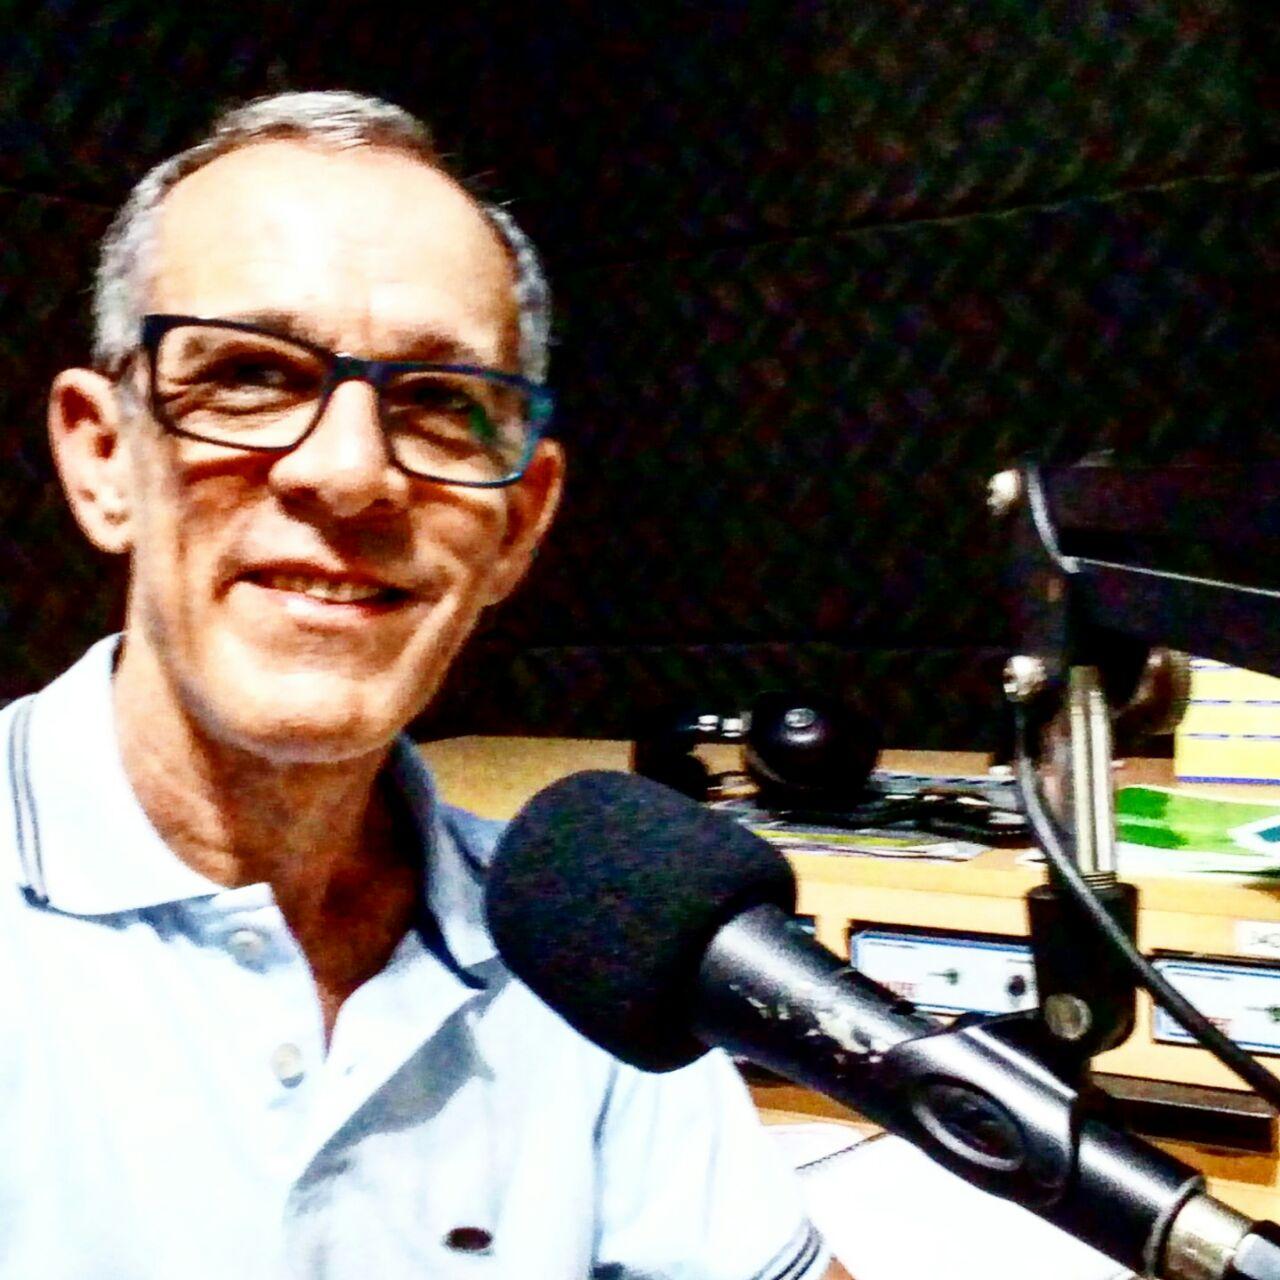 Santino Vitor